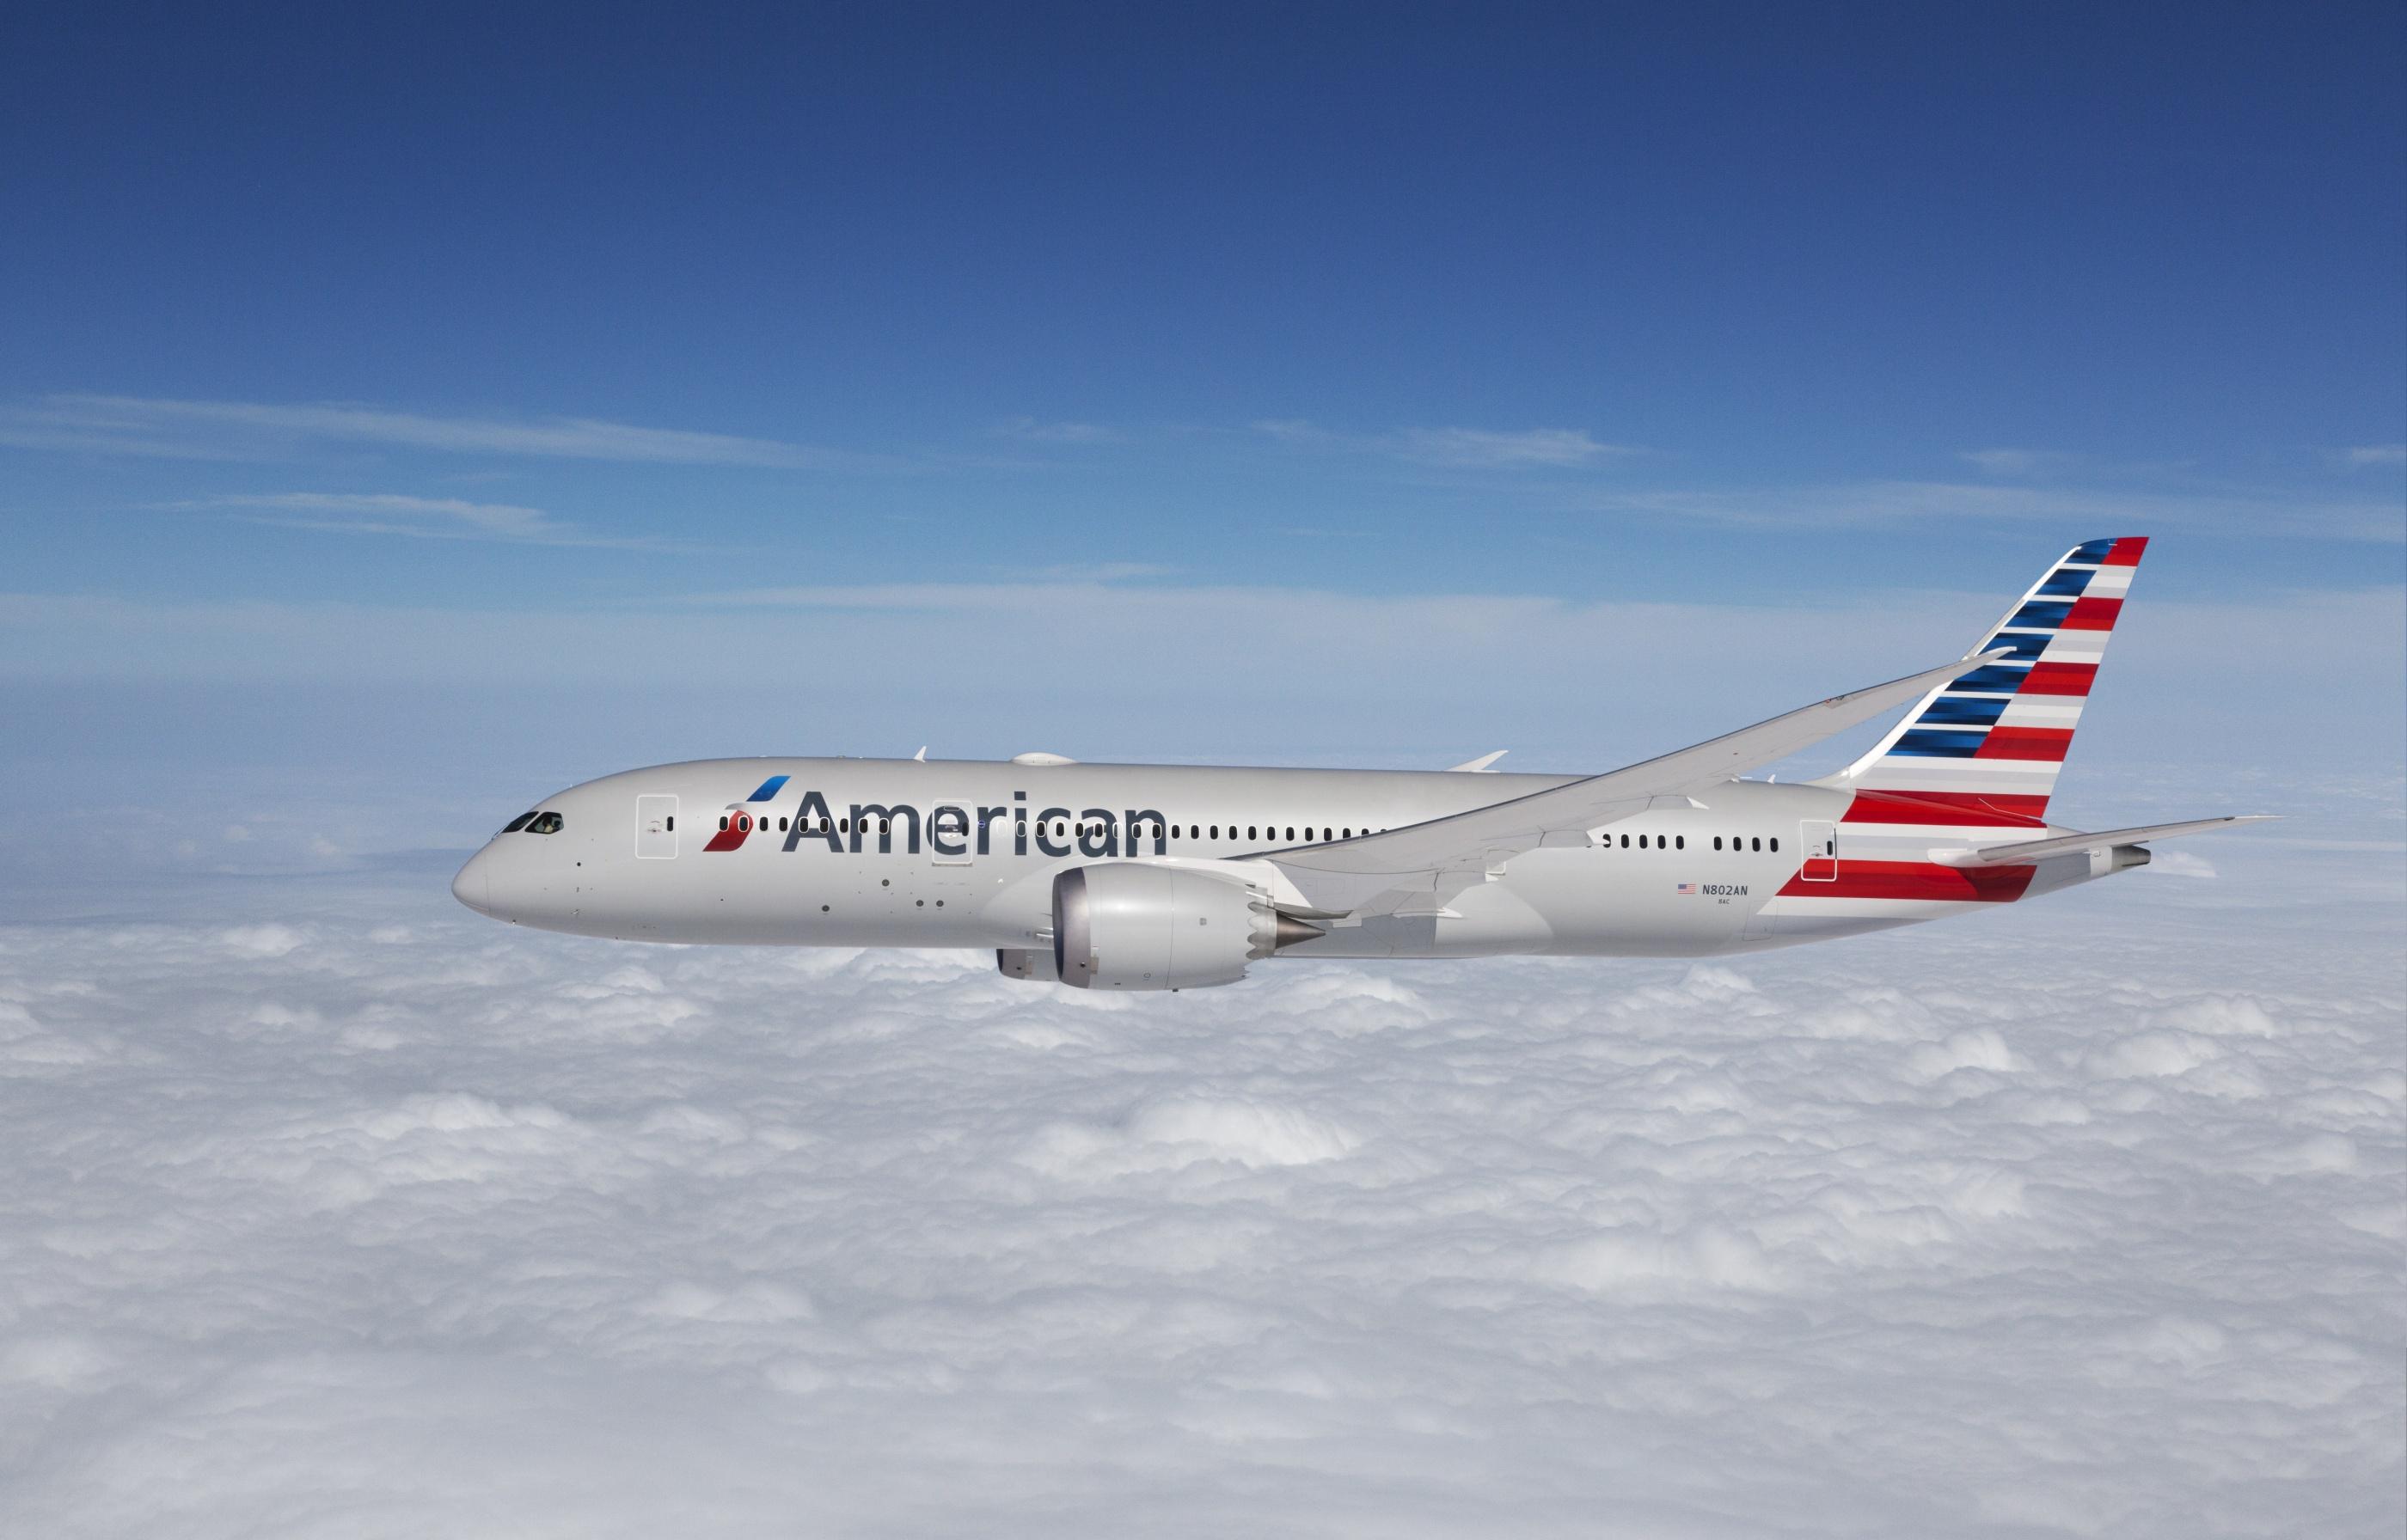 American Airlines budou z Prahy do Chicaga létat s Boeingem 787-8. Foto: AA